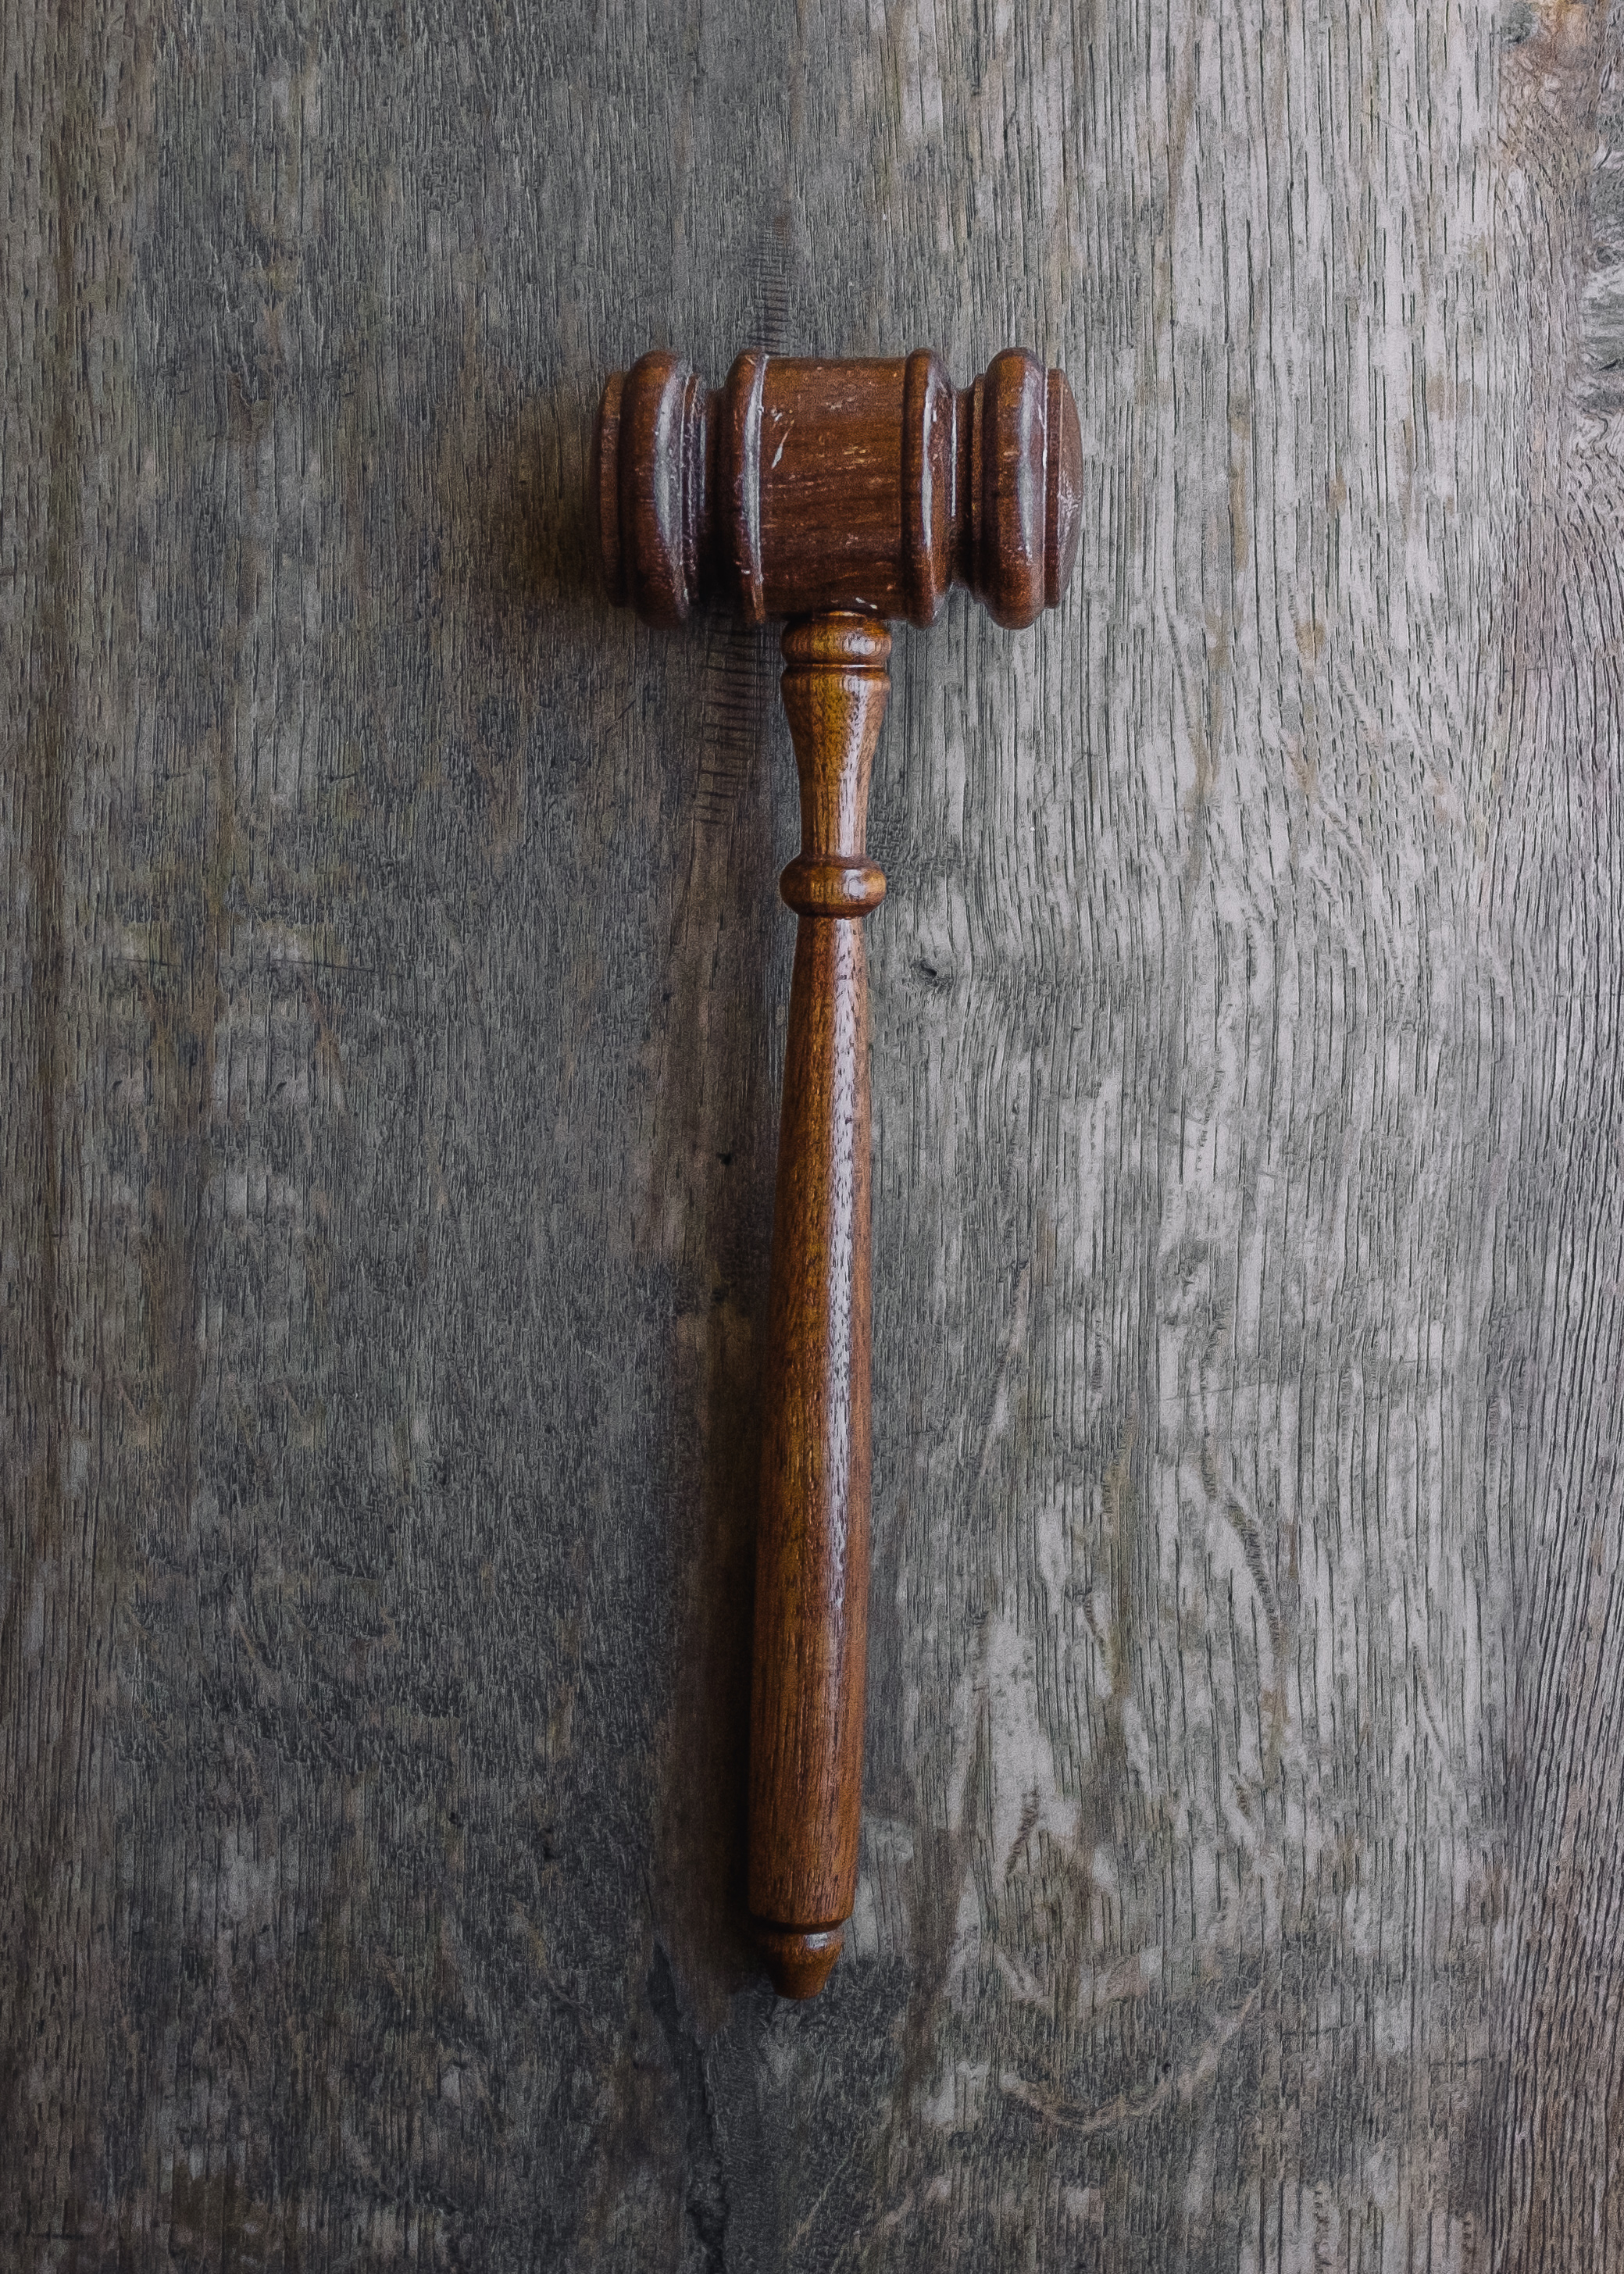 gavel on a desk